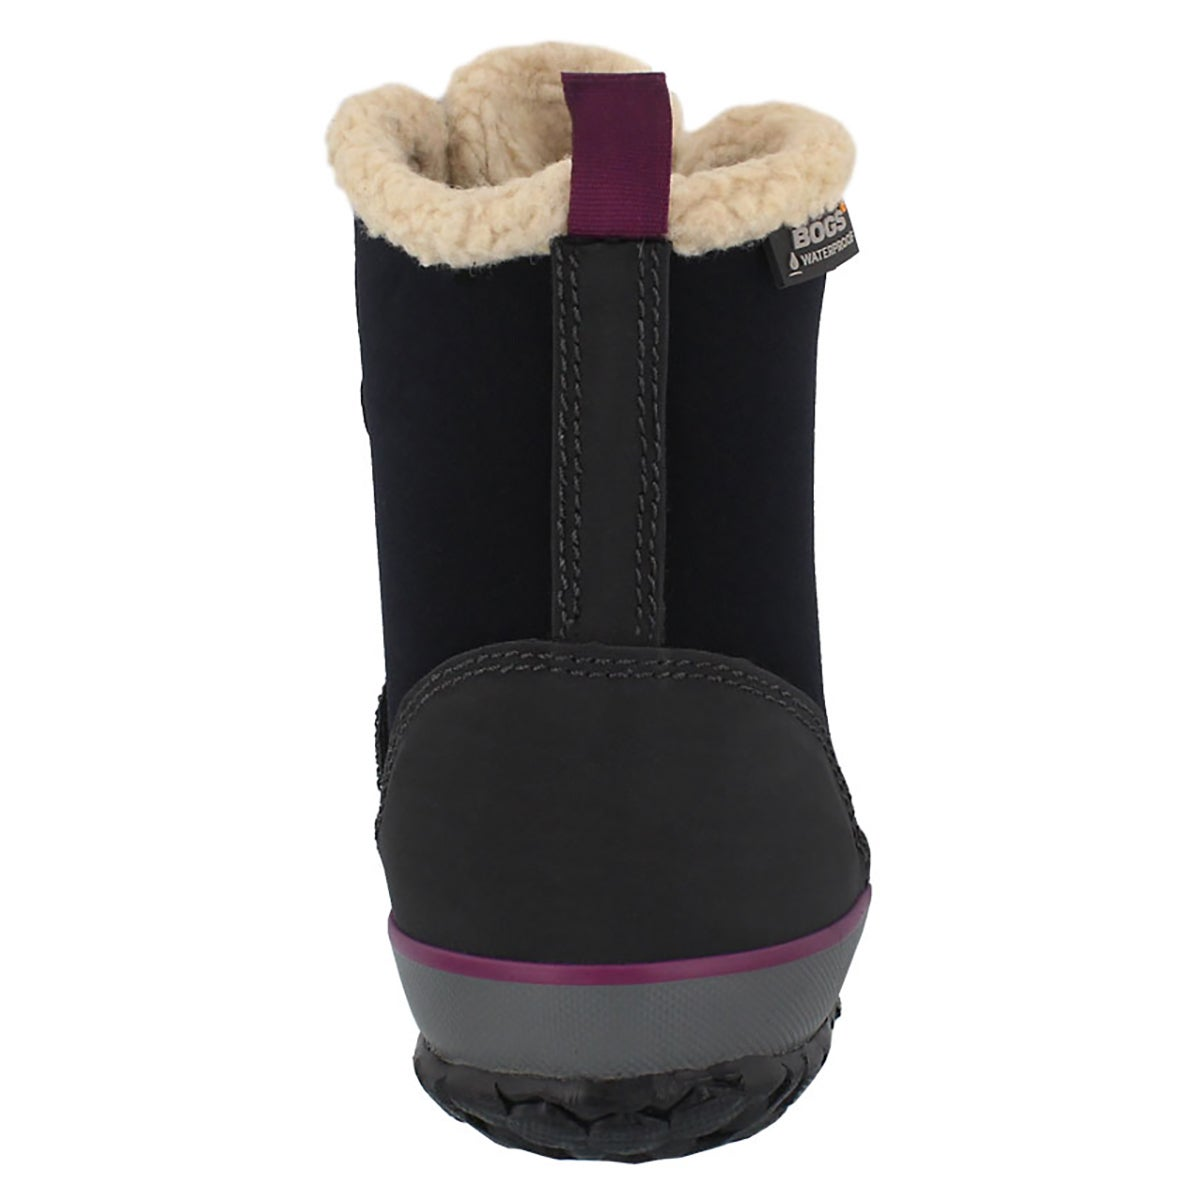 Lds Skylar black laceup wtpf boot